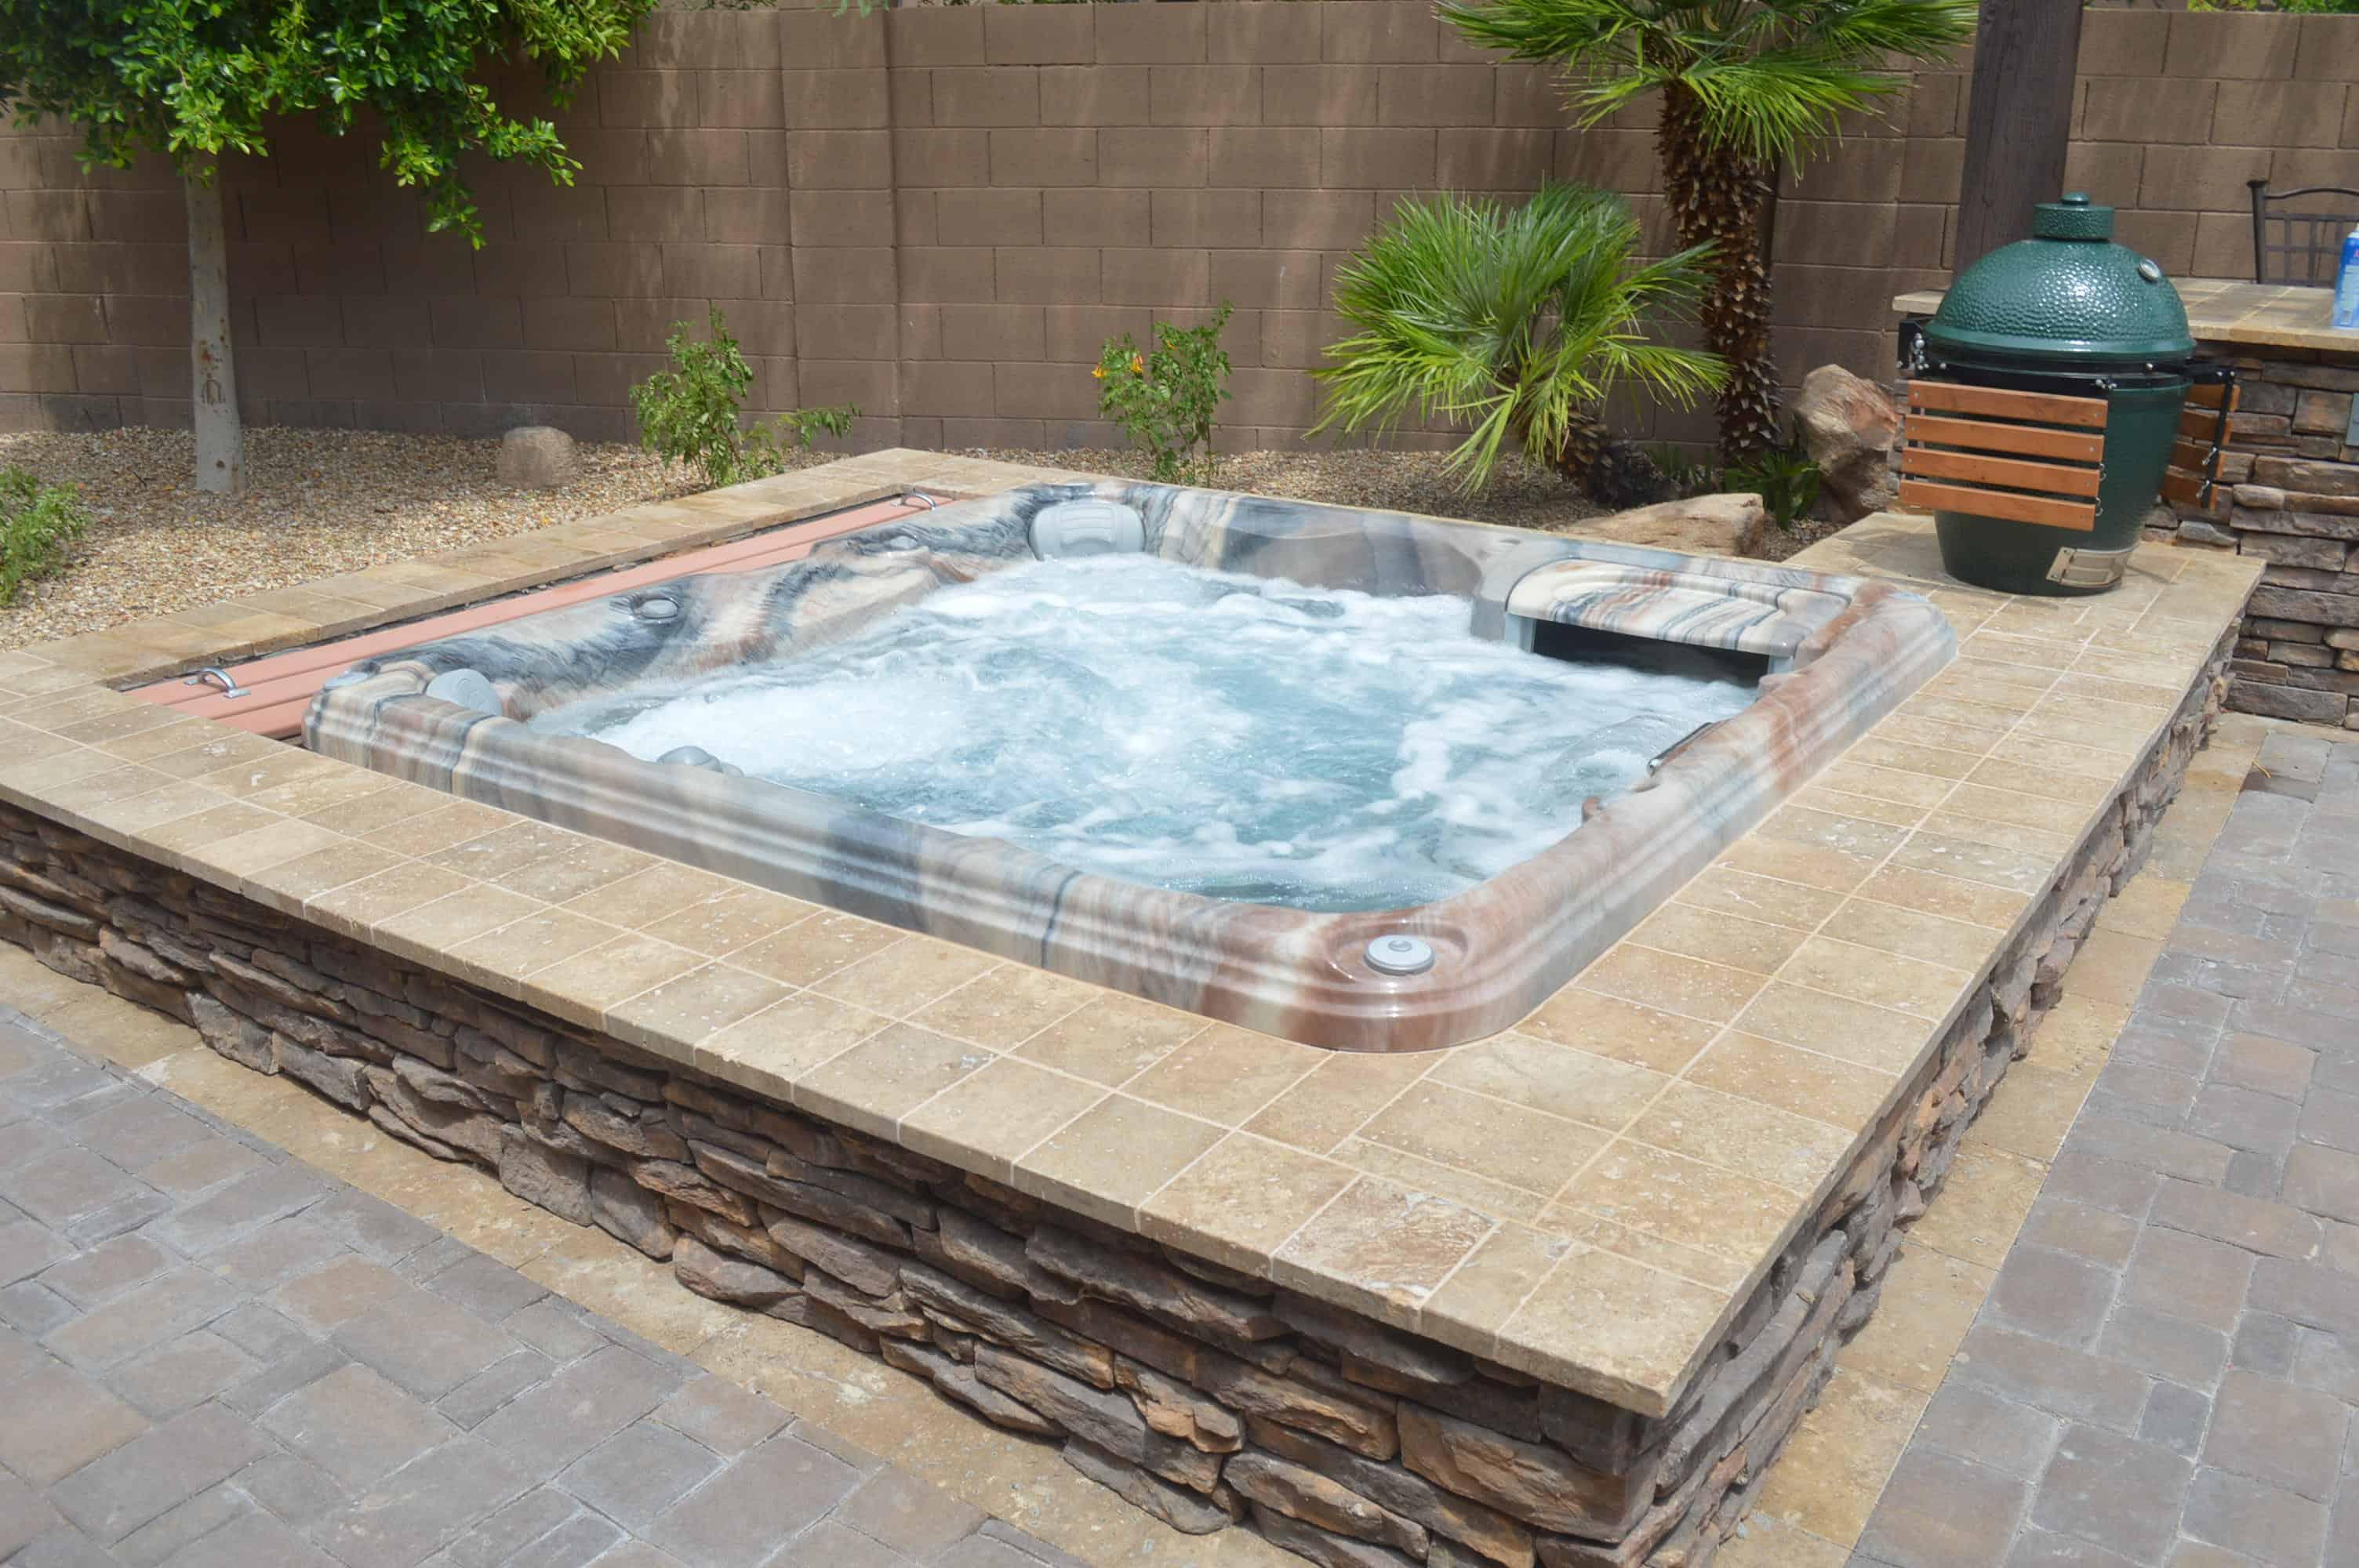 imagine-backyard-living-hot-tub-spa-jacuzzi-sundance-59